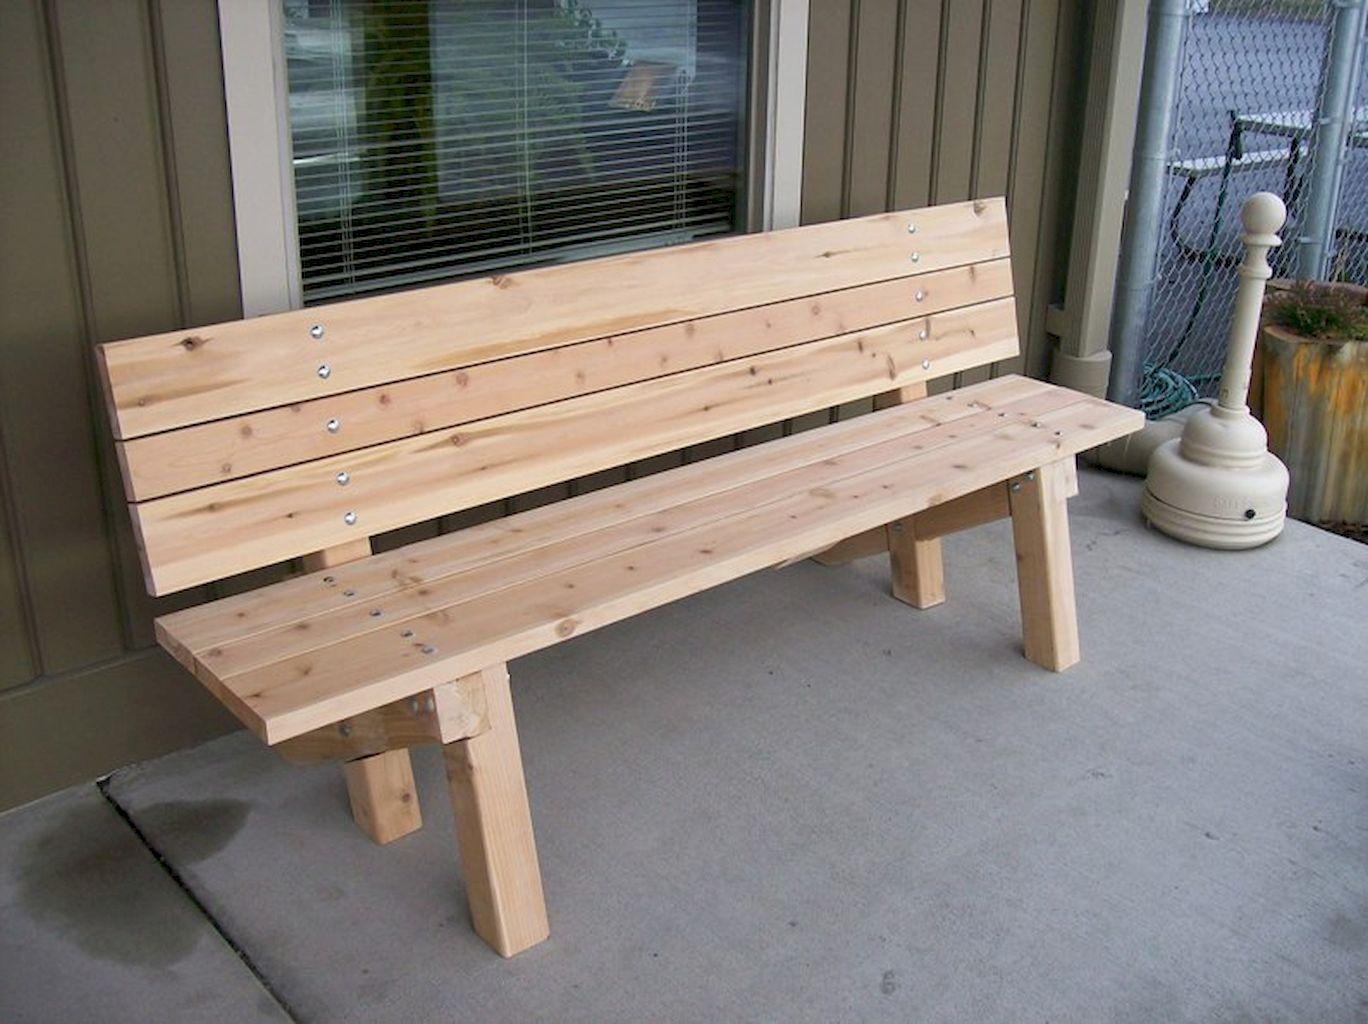 Stupendous 40 Awesome Diy Outdoor Bench Design Ideas Diy Craft And Inzonedesignstudio Interior Chair Design Inzonedesignstudiocom